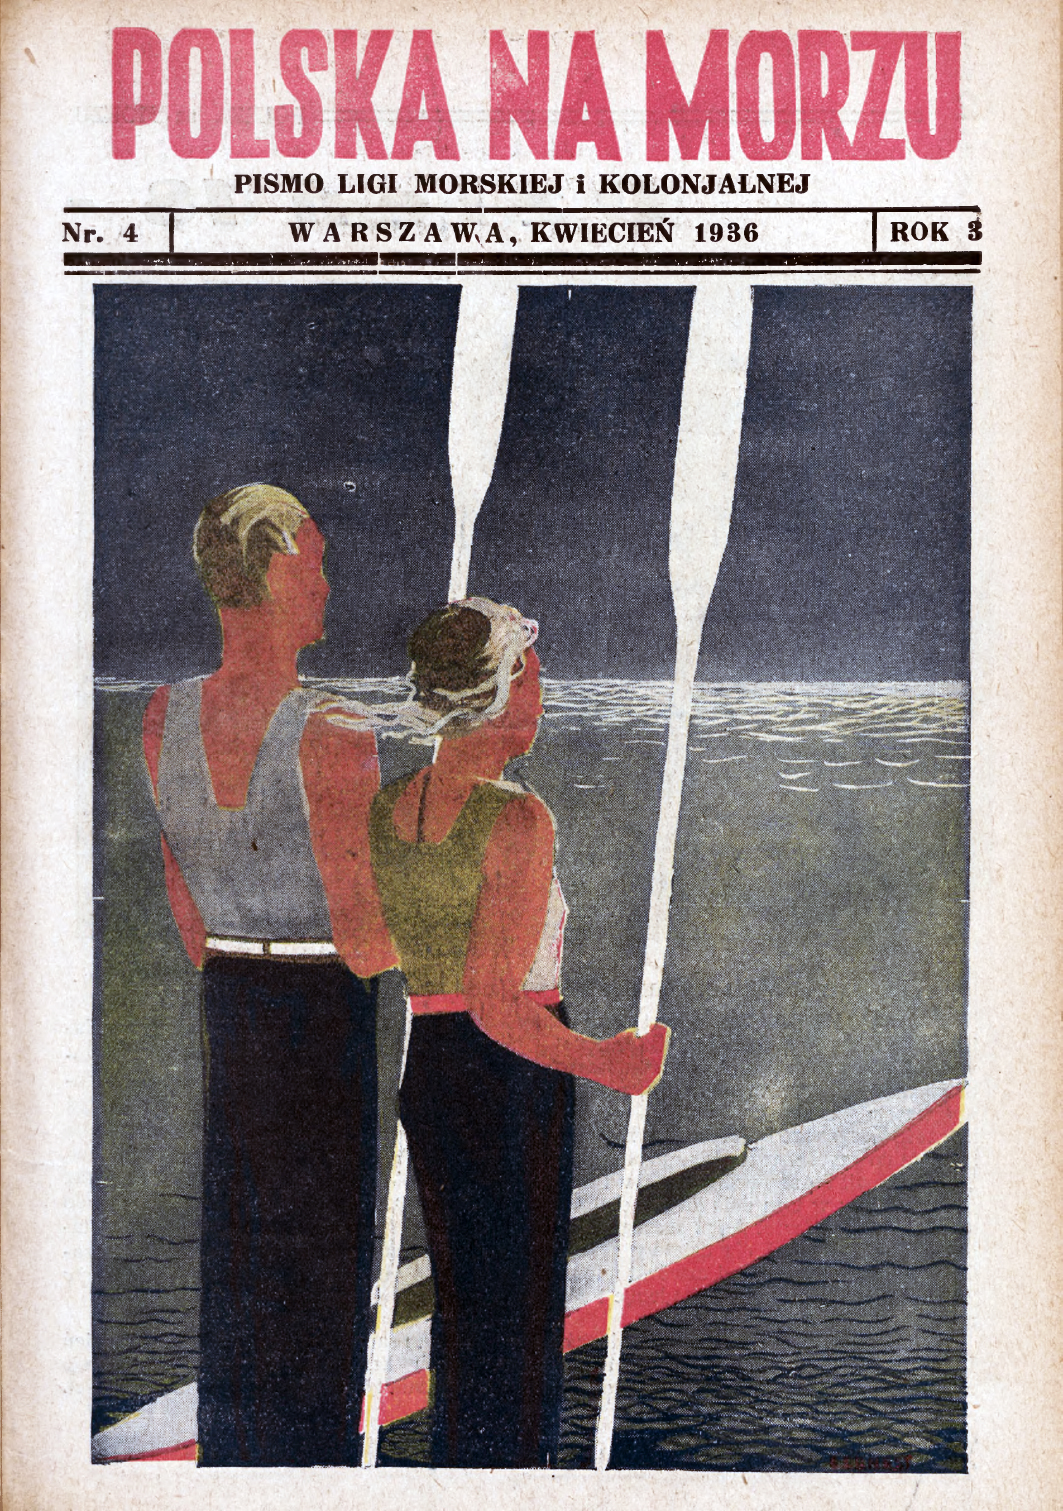 Polska na Morzu : pismo Ligi Morskiej i Kolonjalnej. - Liga Morska i Kolonjalna, 1936, nr 4